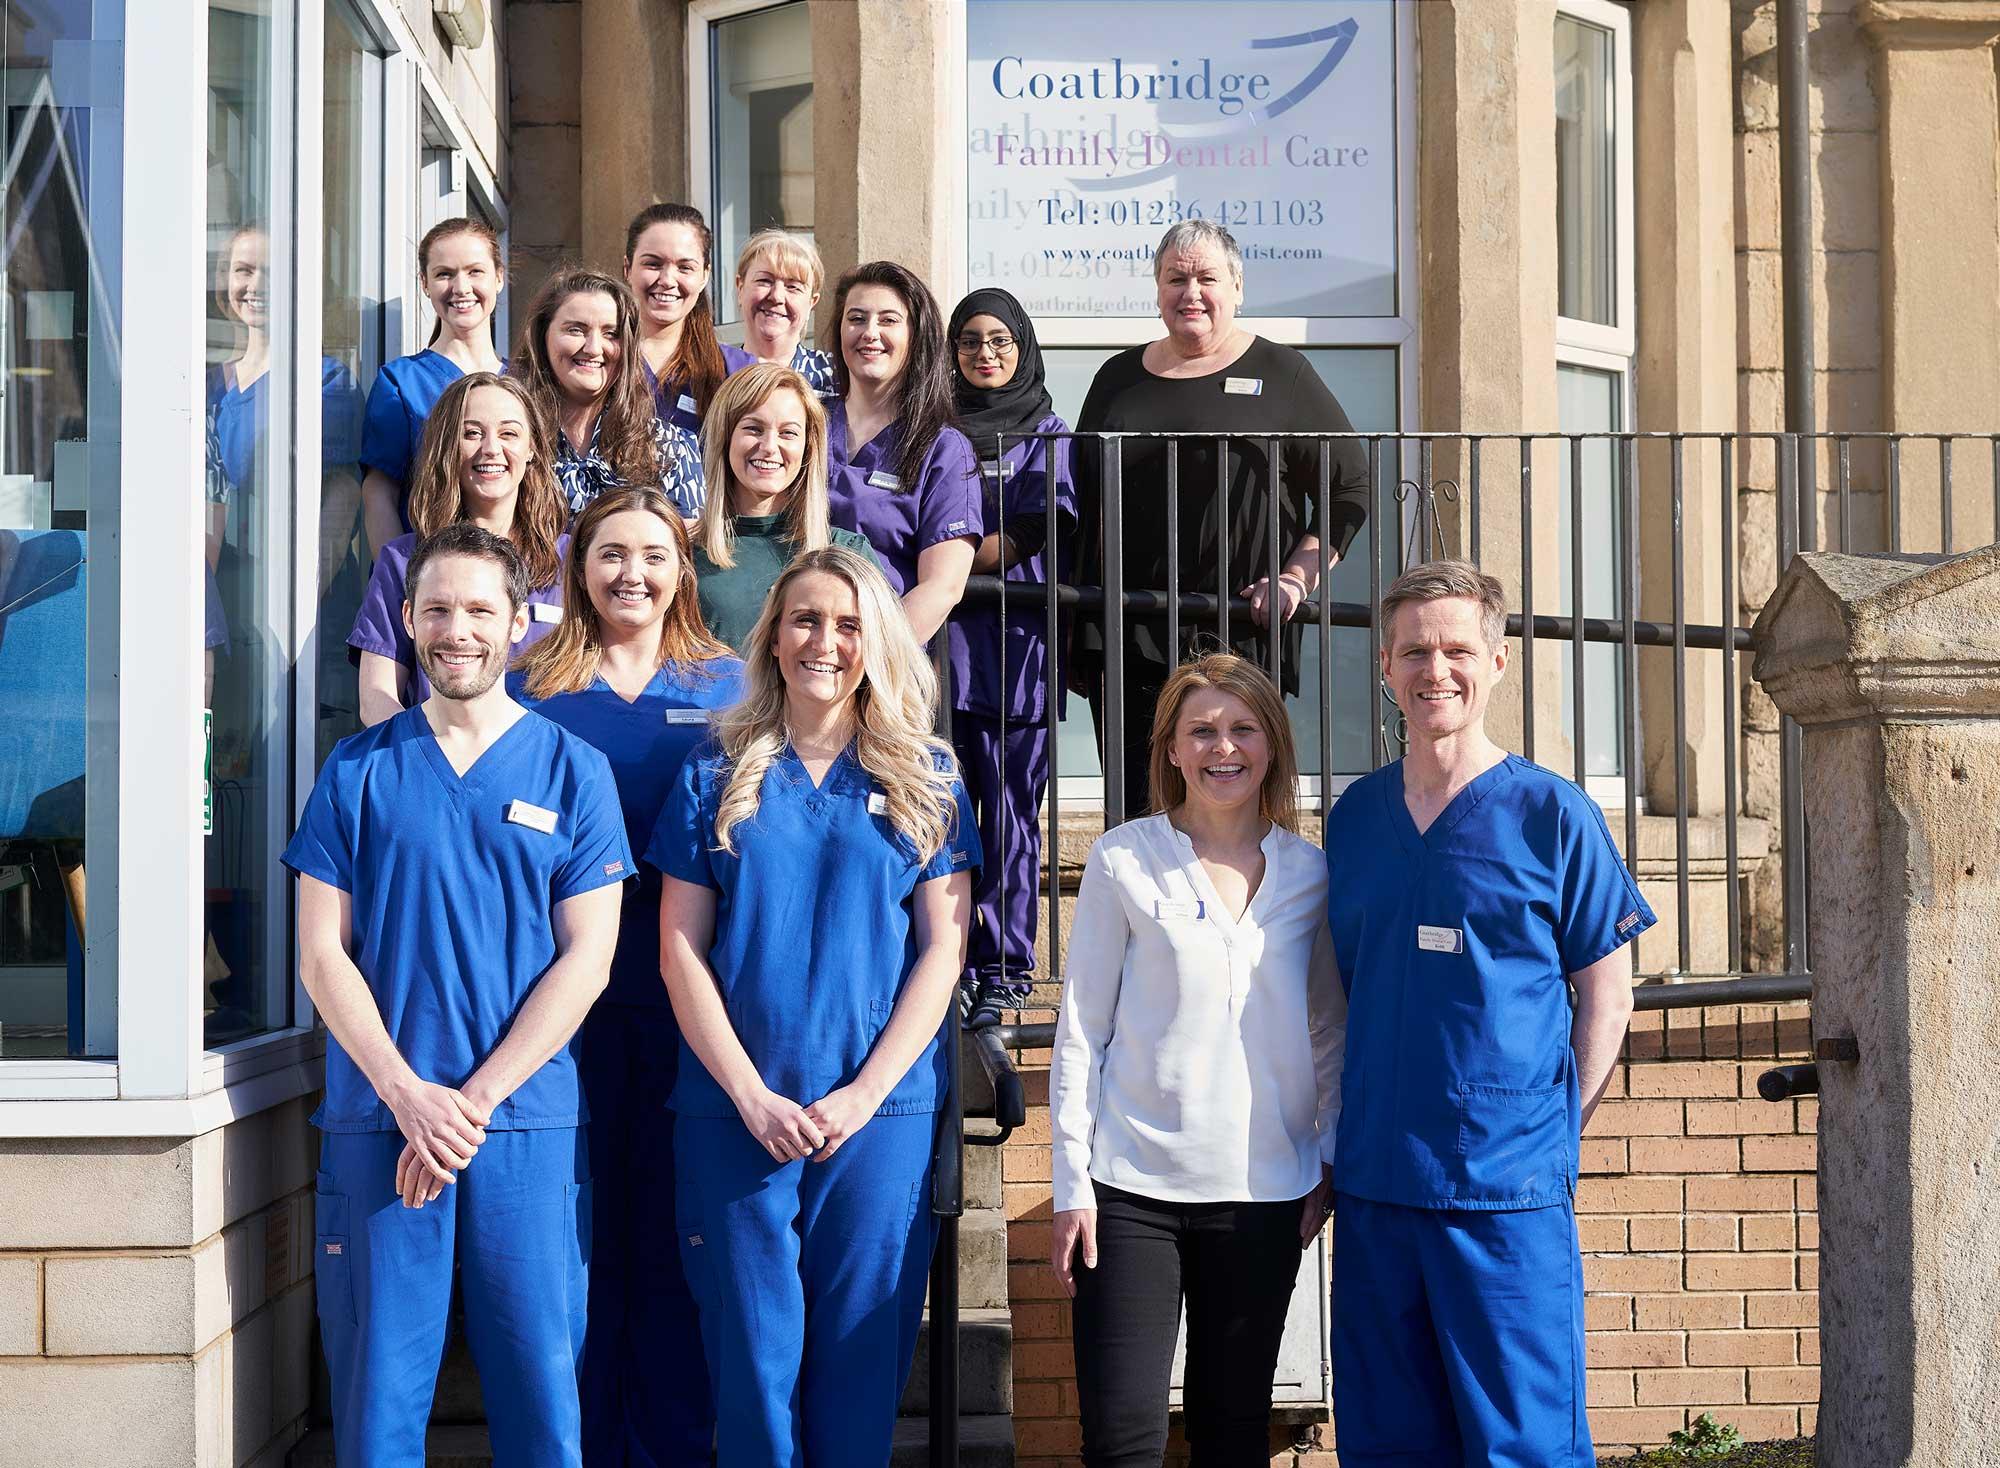 Coatbridge Family Dental team